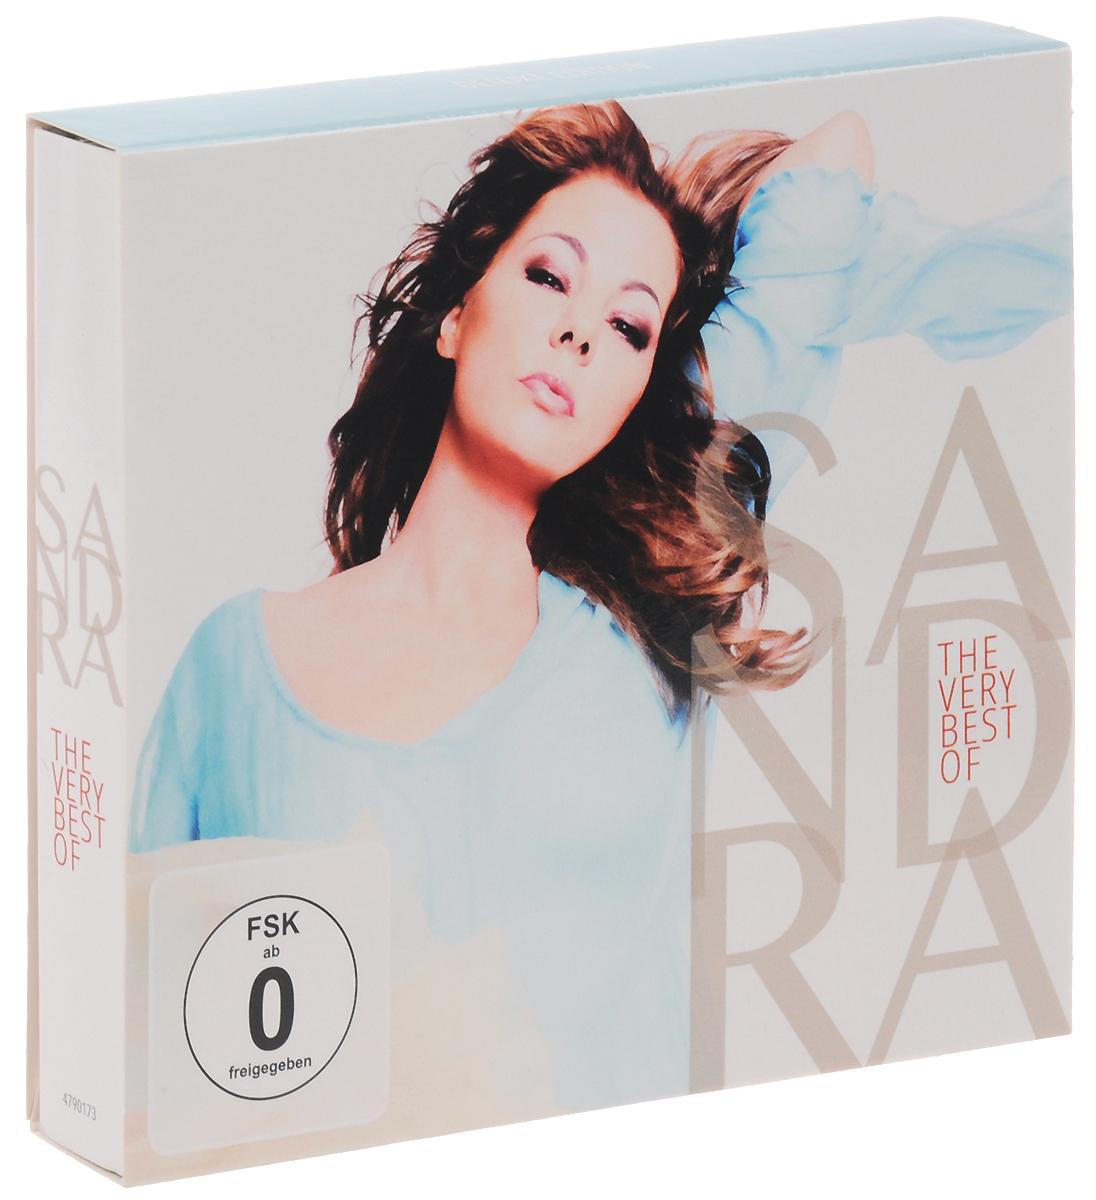 Sandra Sandra. The Very Best Of Sandra. Deluxe Edition (2 CD + DVD) sandra sandra stay in touch deluxe edition 2 cd